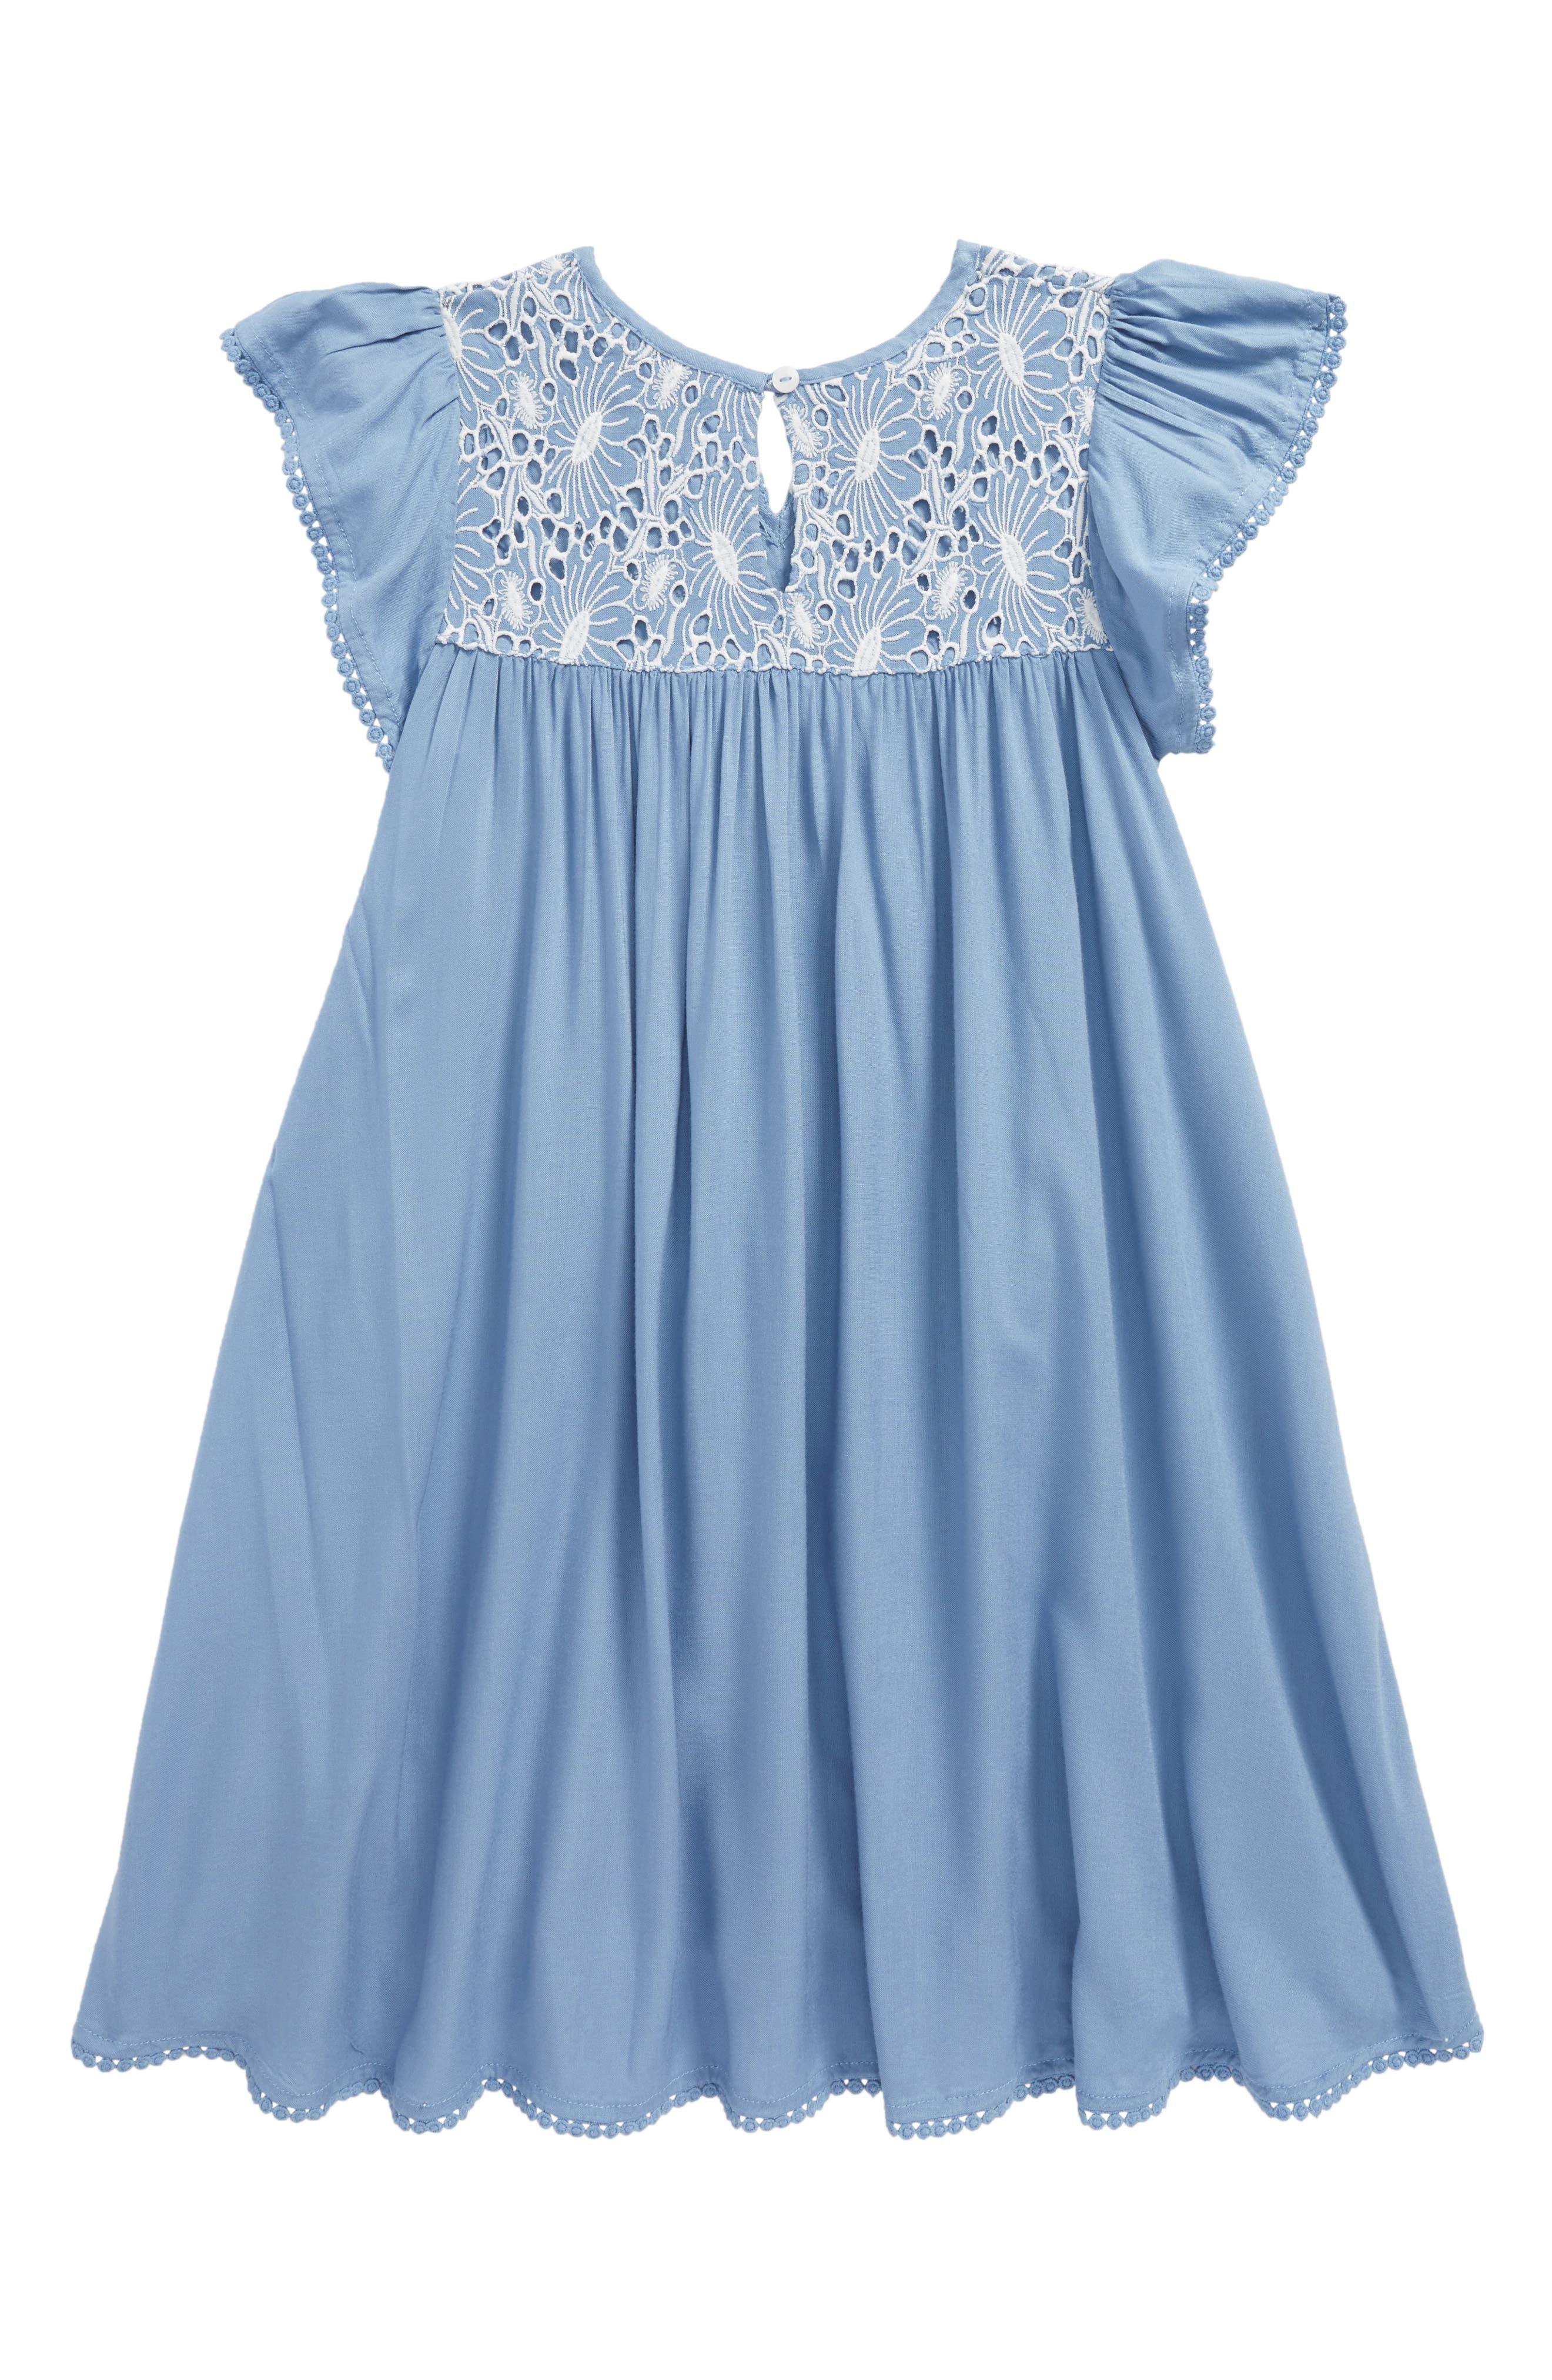 Embroidered Tassel Dress,                             Alternate thumbnail 2, color,                             Blue